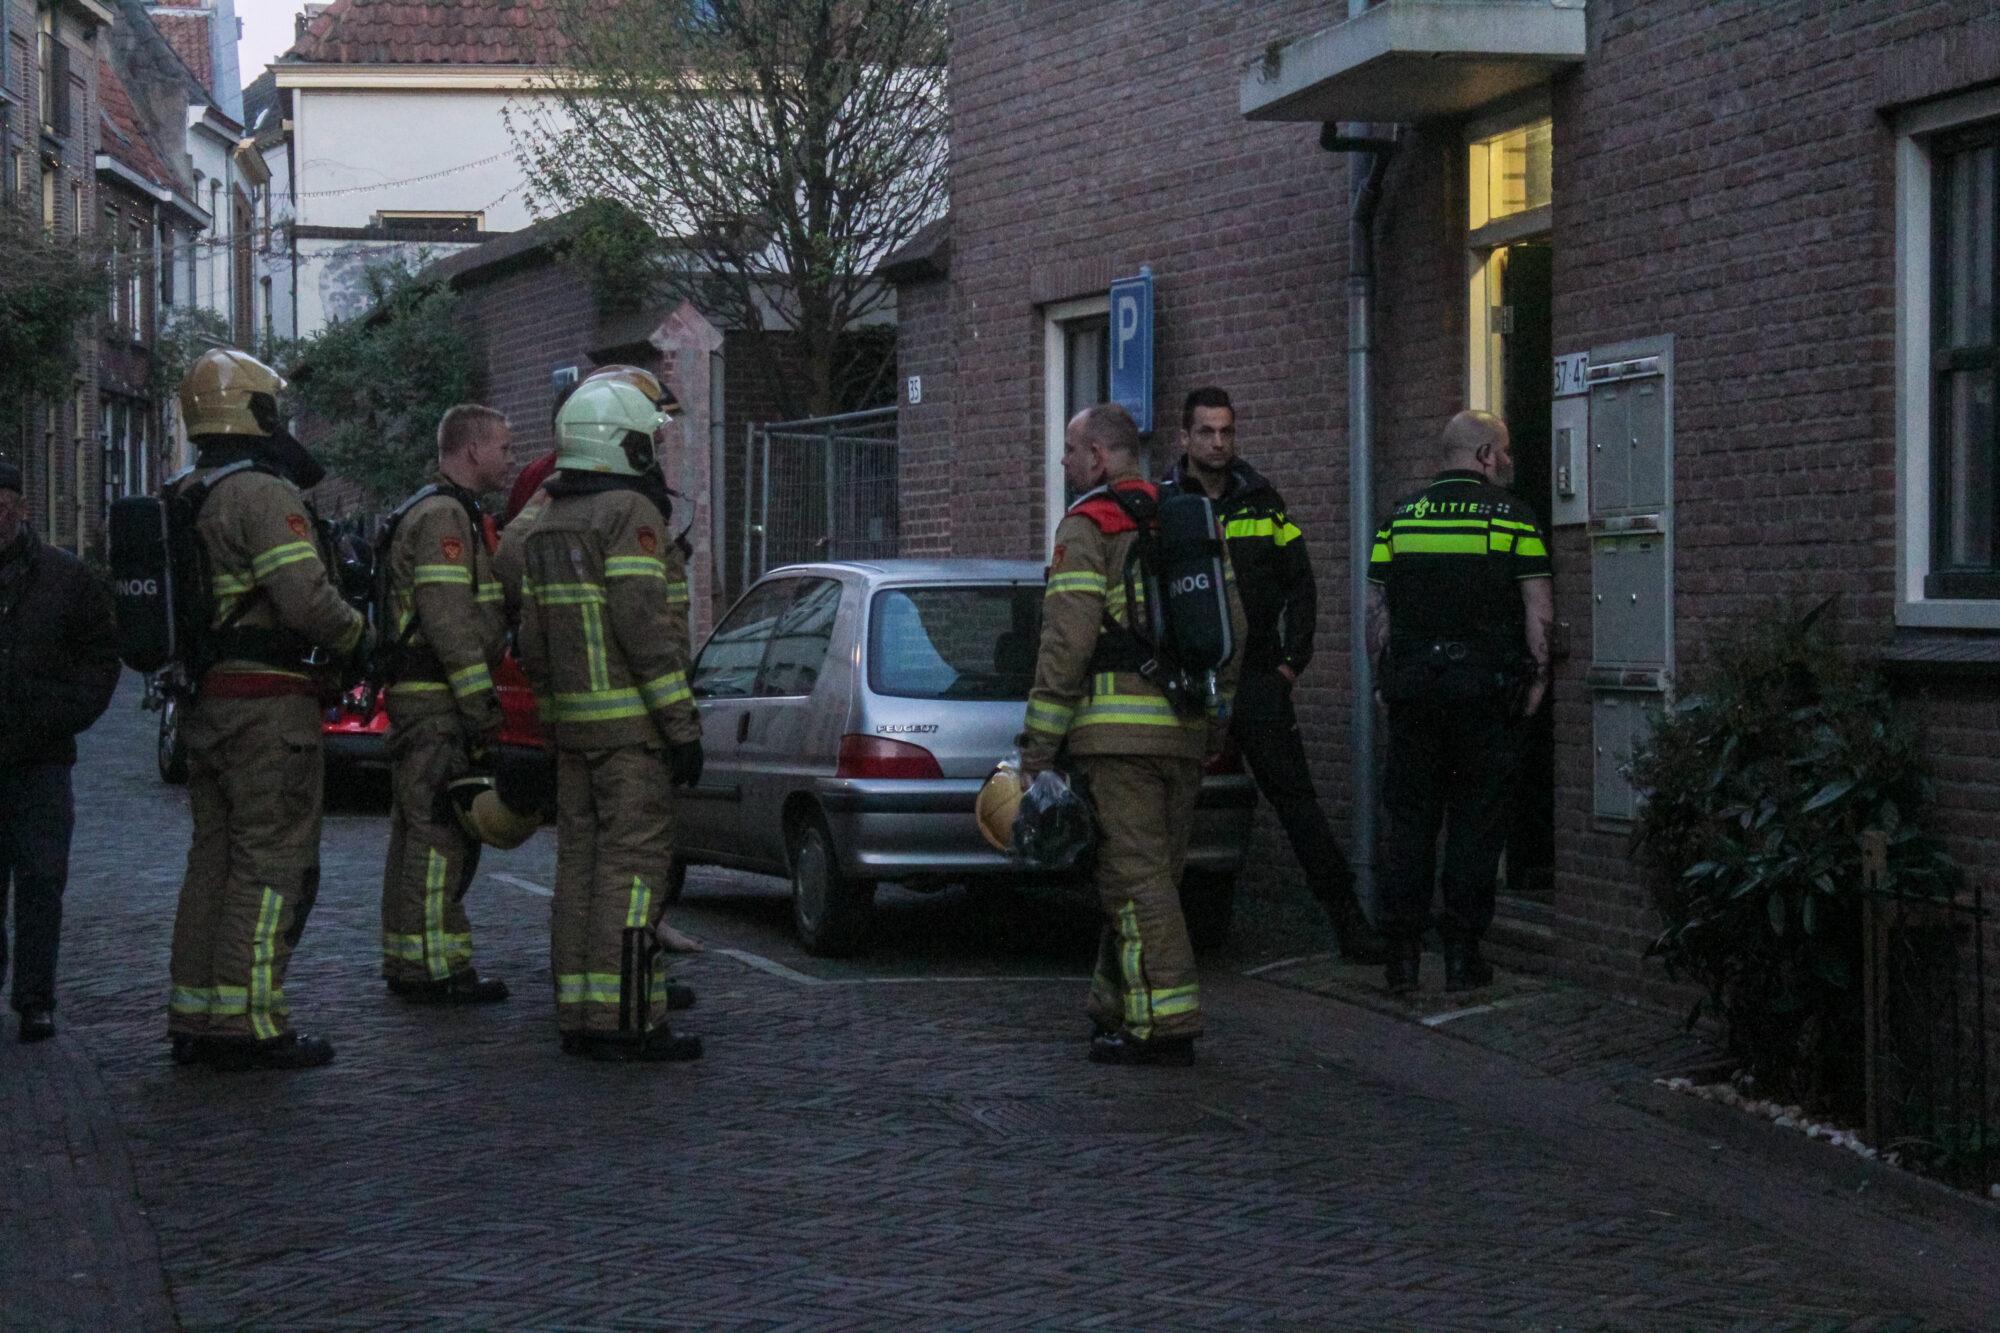 Pannetje op het vuur; brandweer rukt met spoed uit